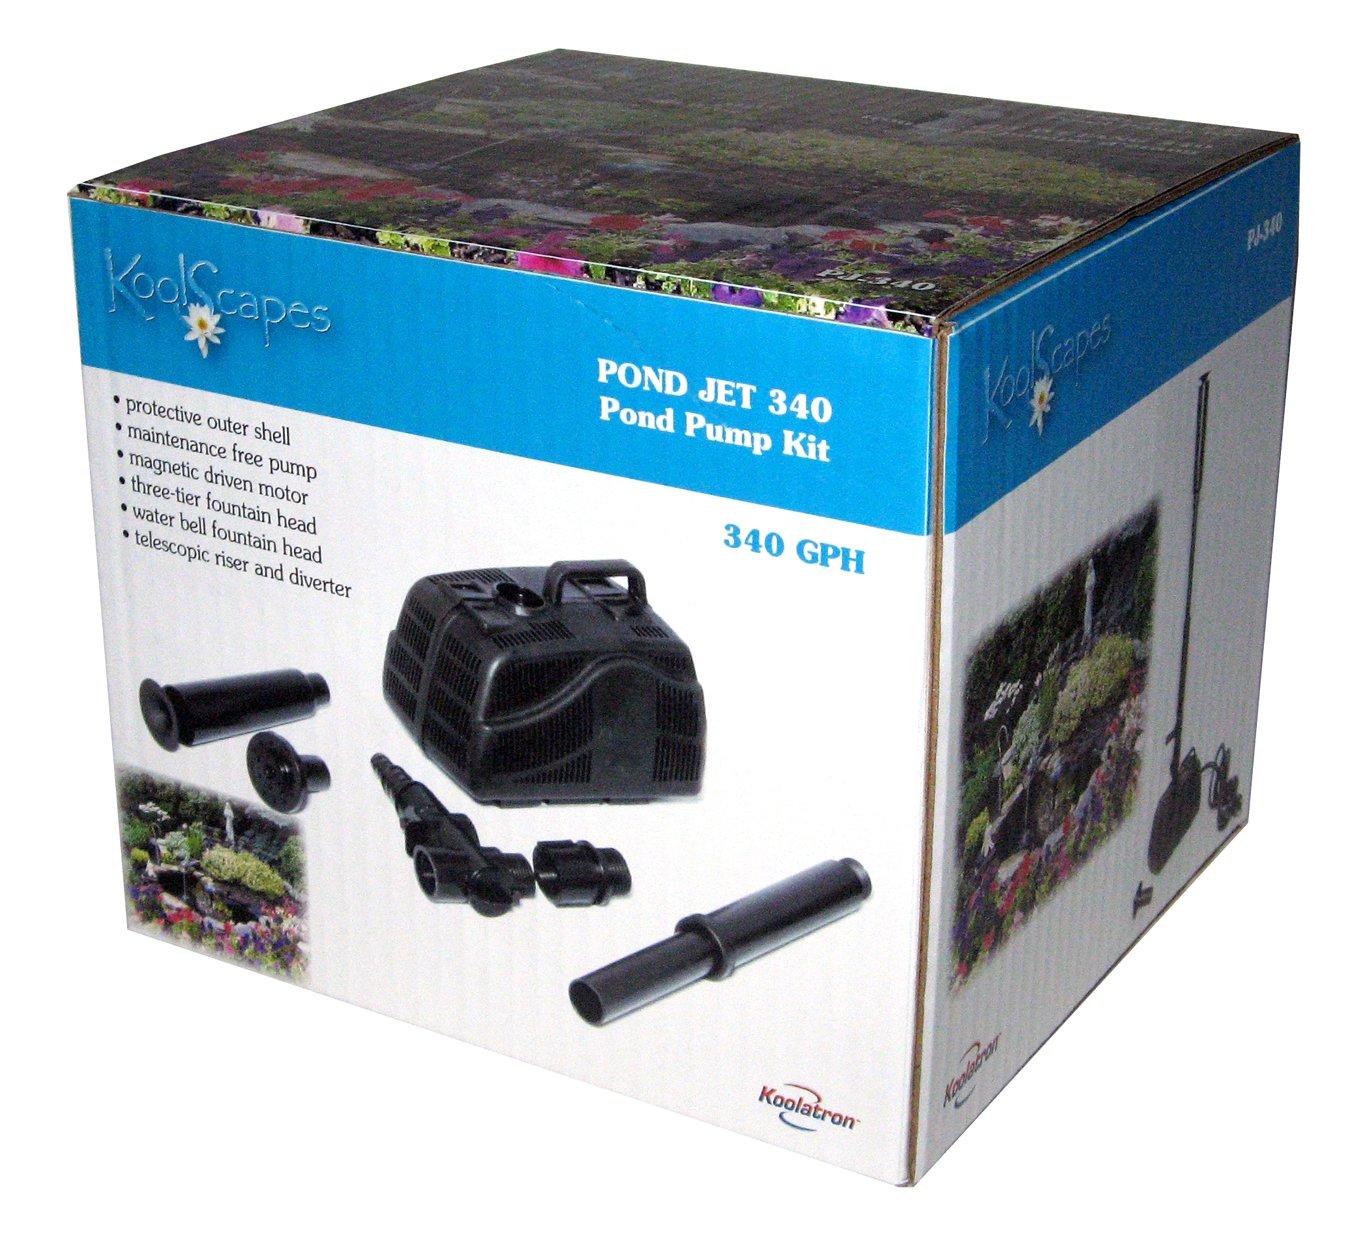 Amazoncom  Koolscapes  GPH Pond Pump Kits  Pond Water Pumps - Amazon pond pumps